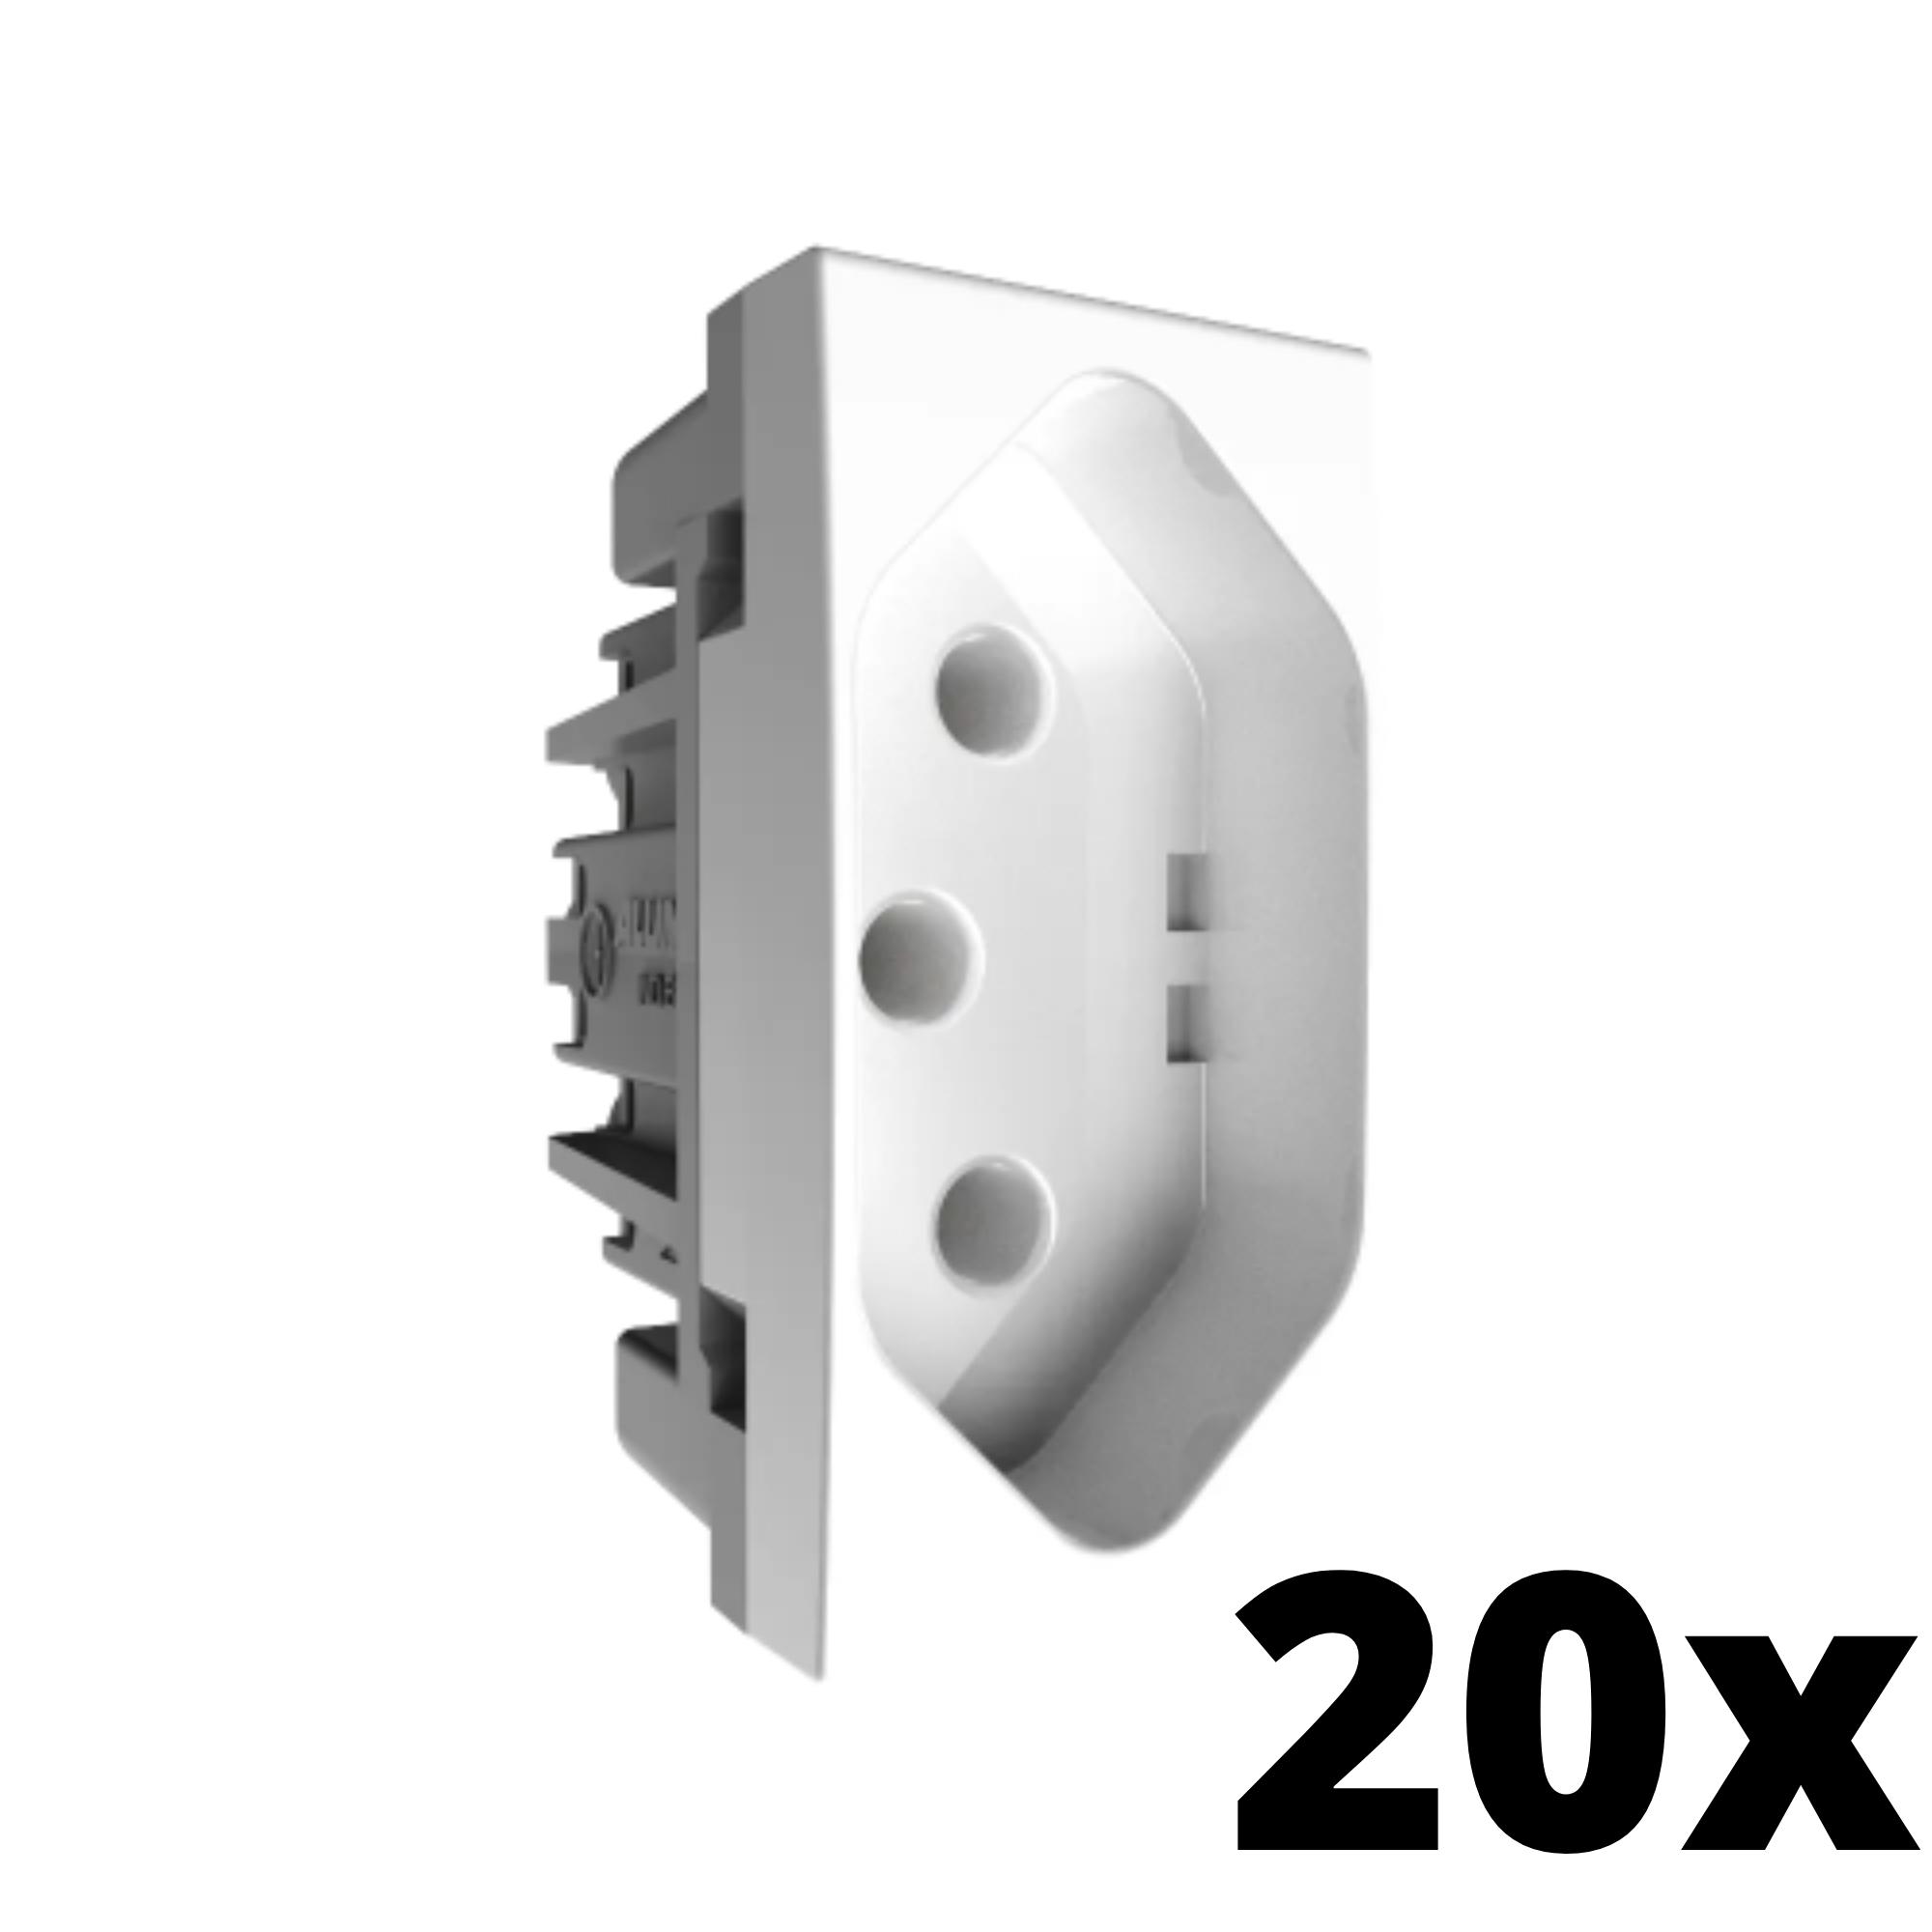 Kit 20 Inova Pró Módulo de Tomada 10A